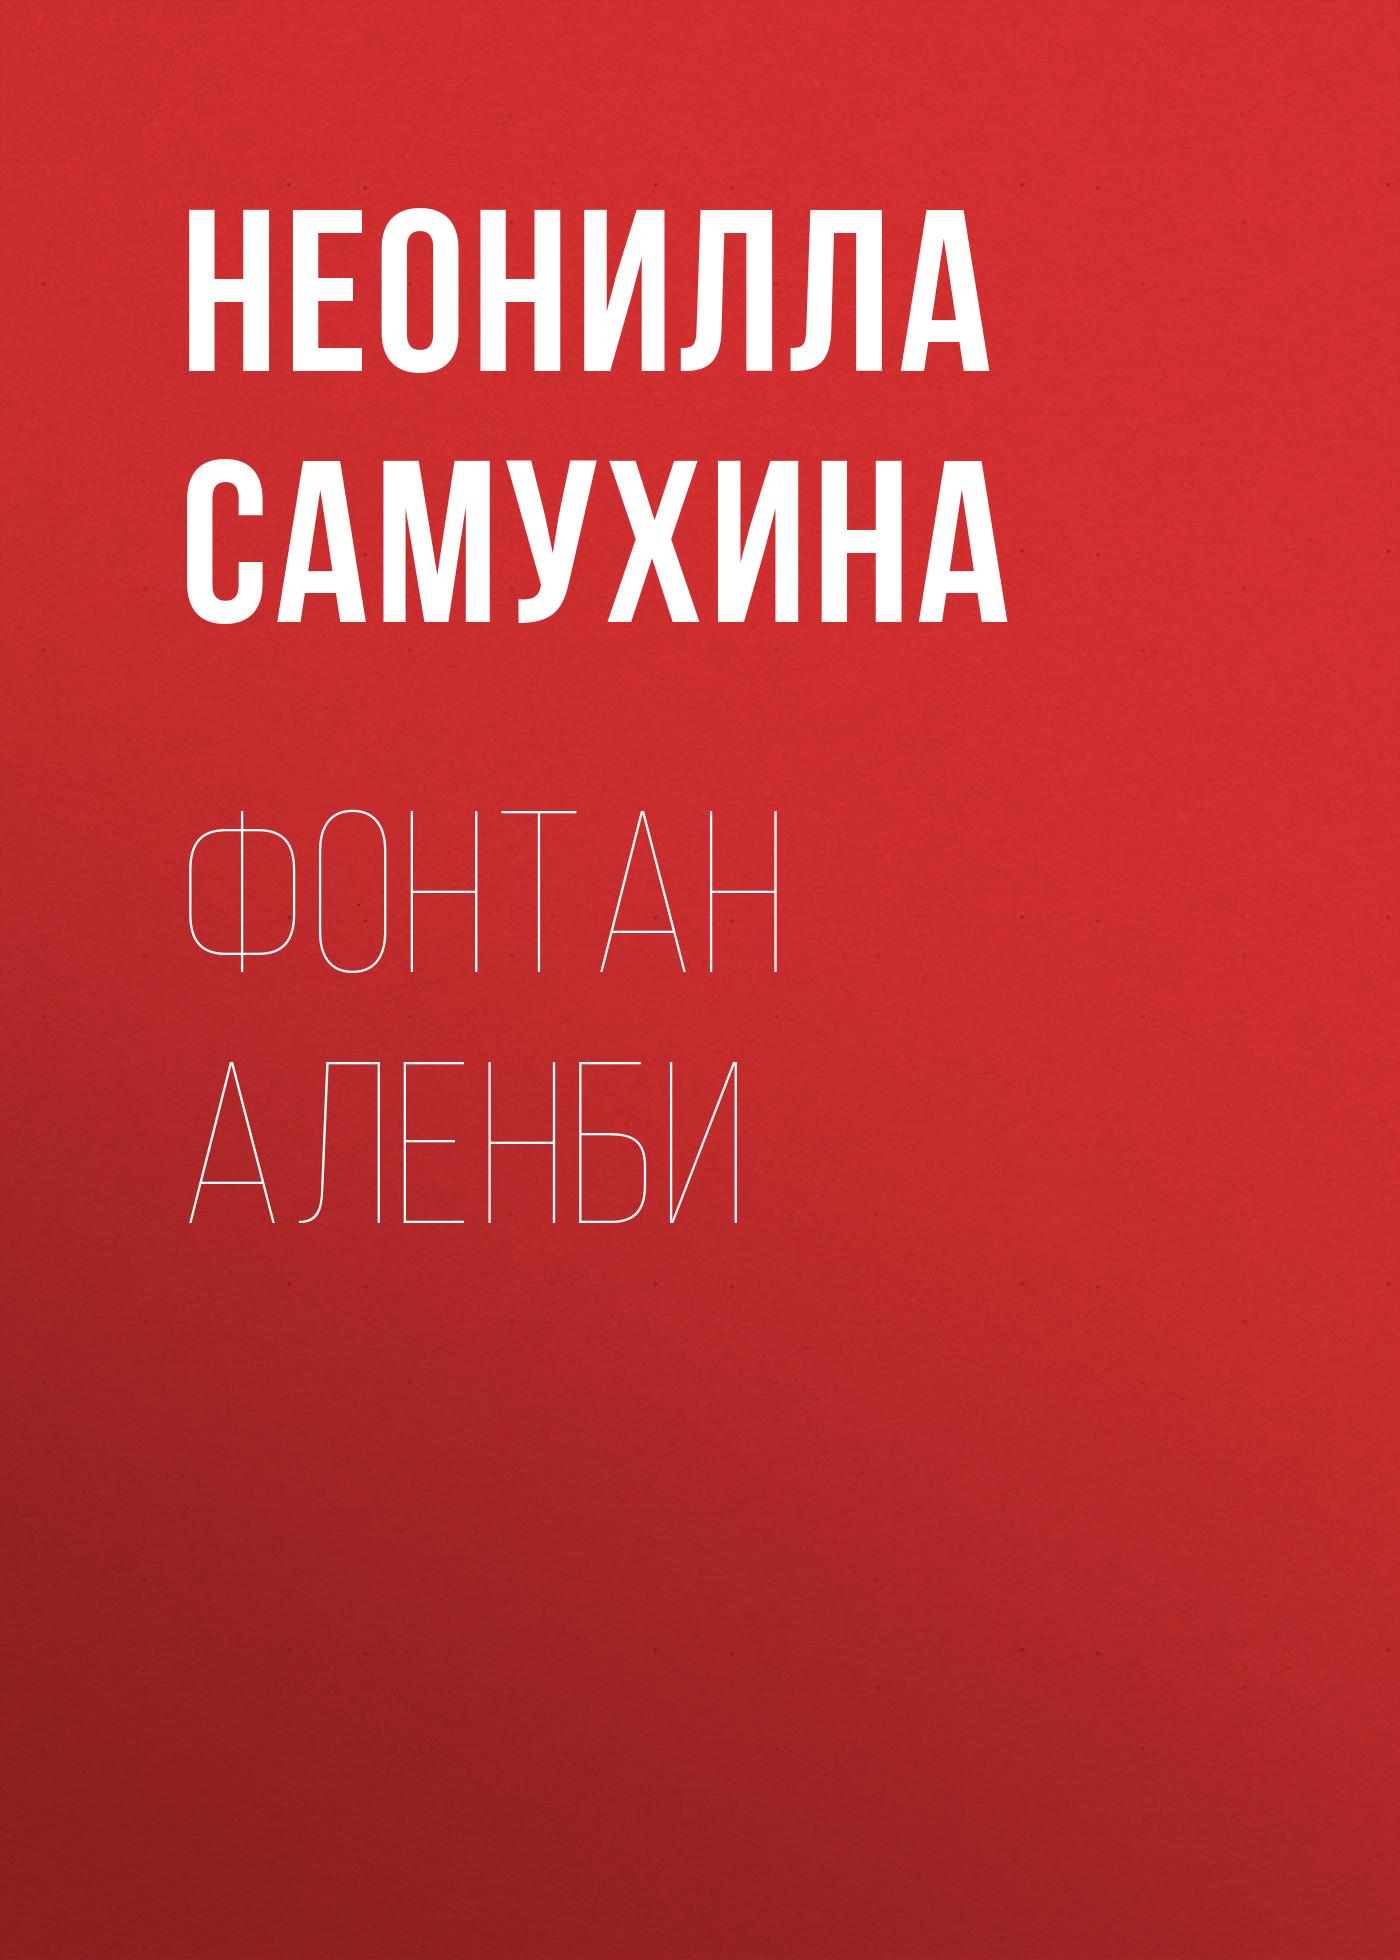 Фонтан Аленби